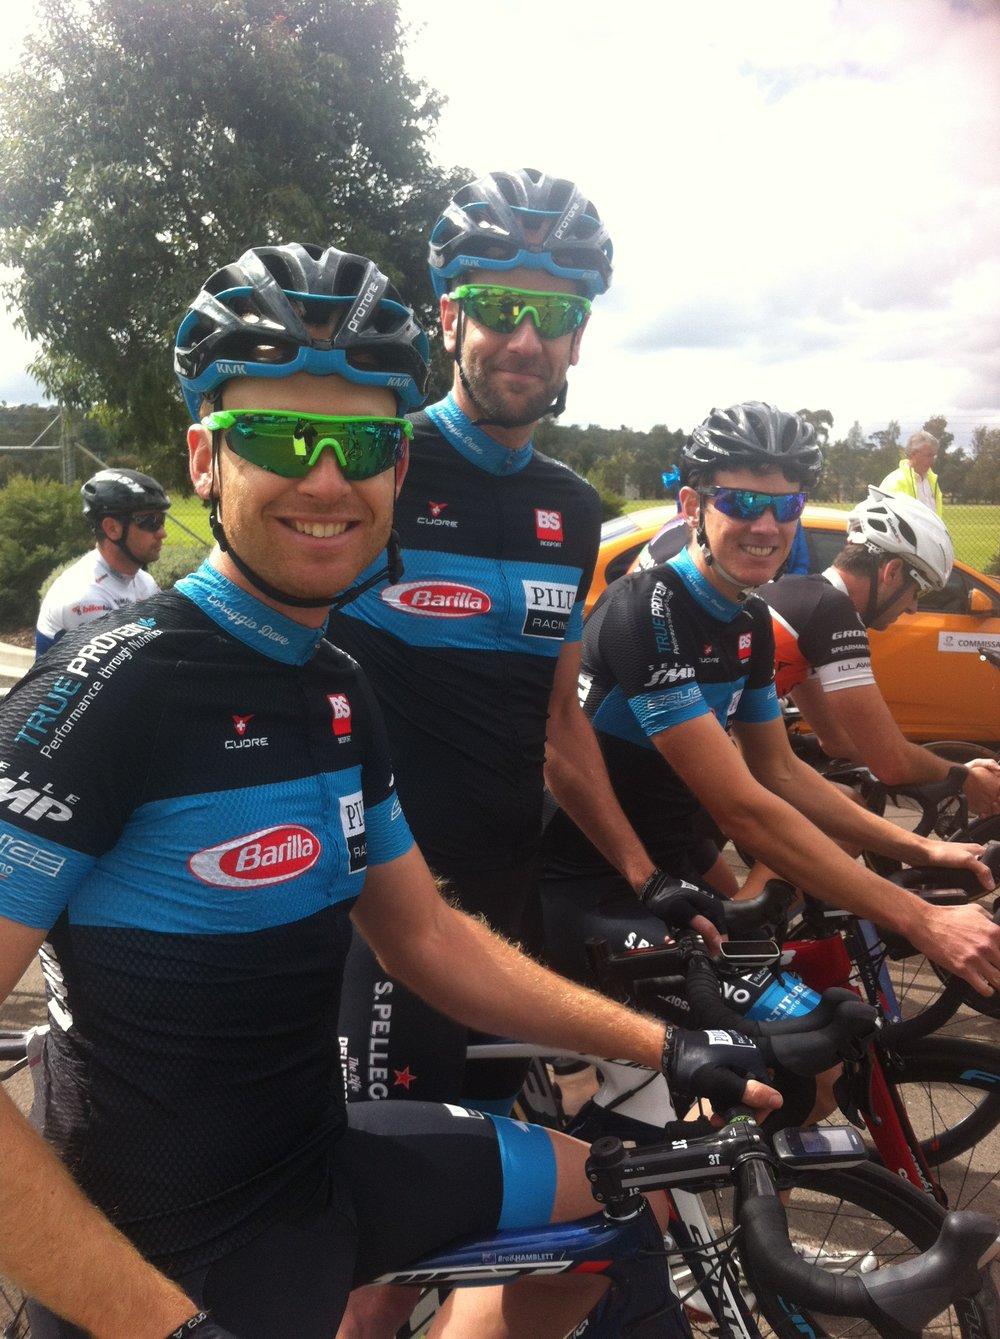 Griffith 16 - BiciSport Pilu Racing Team